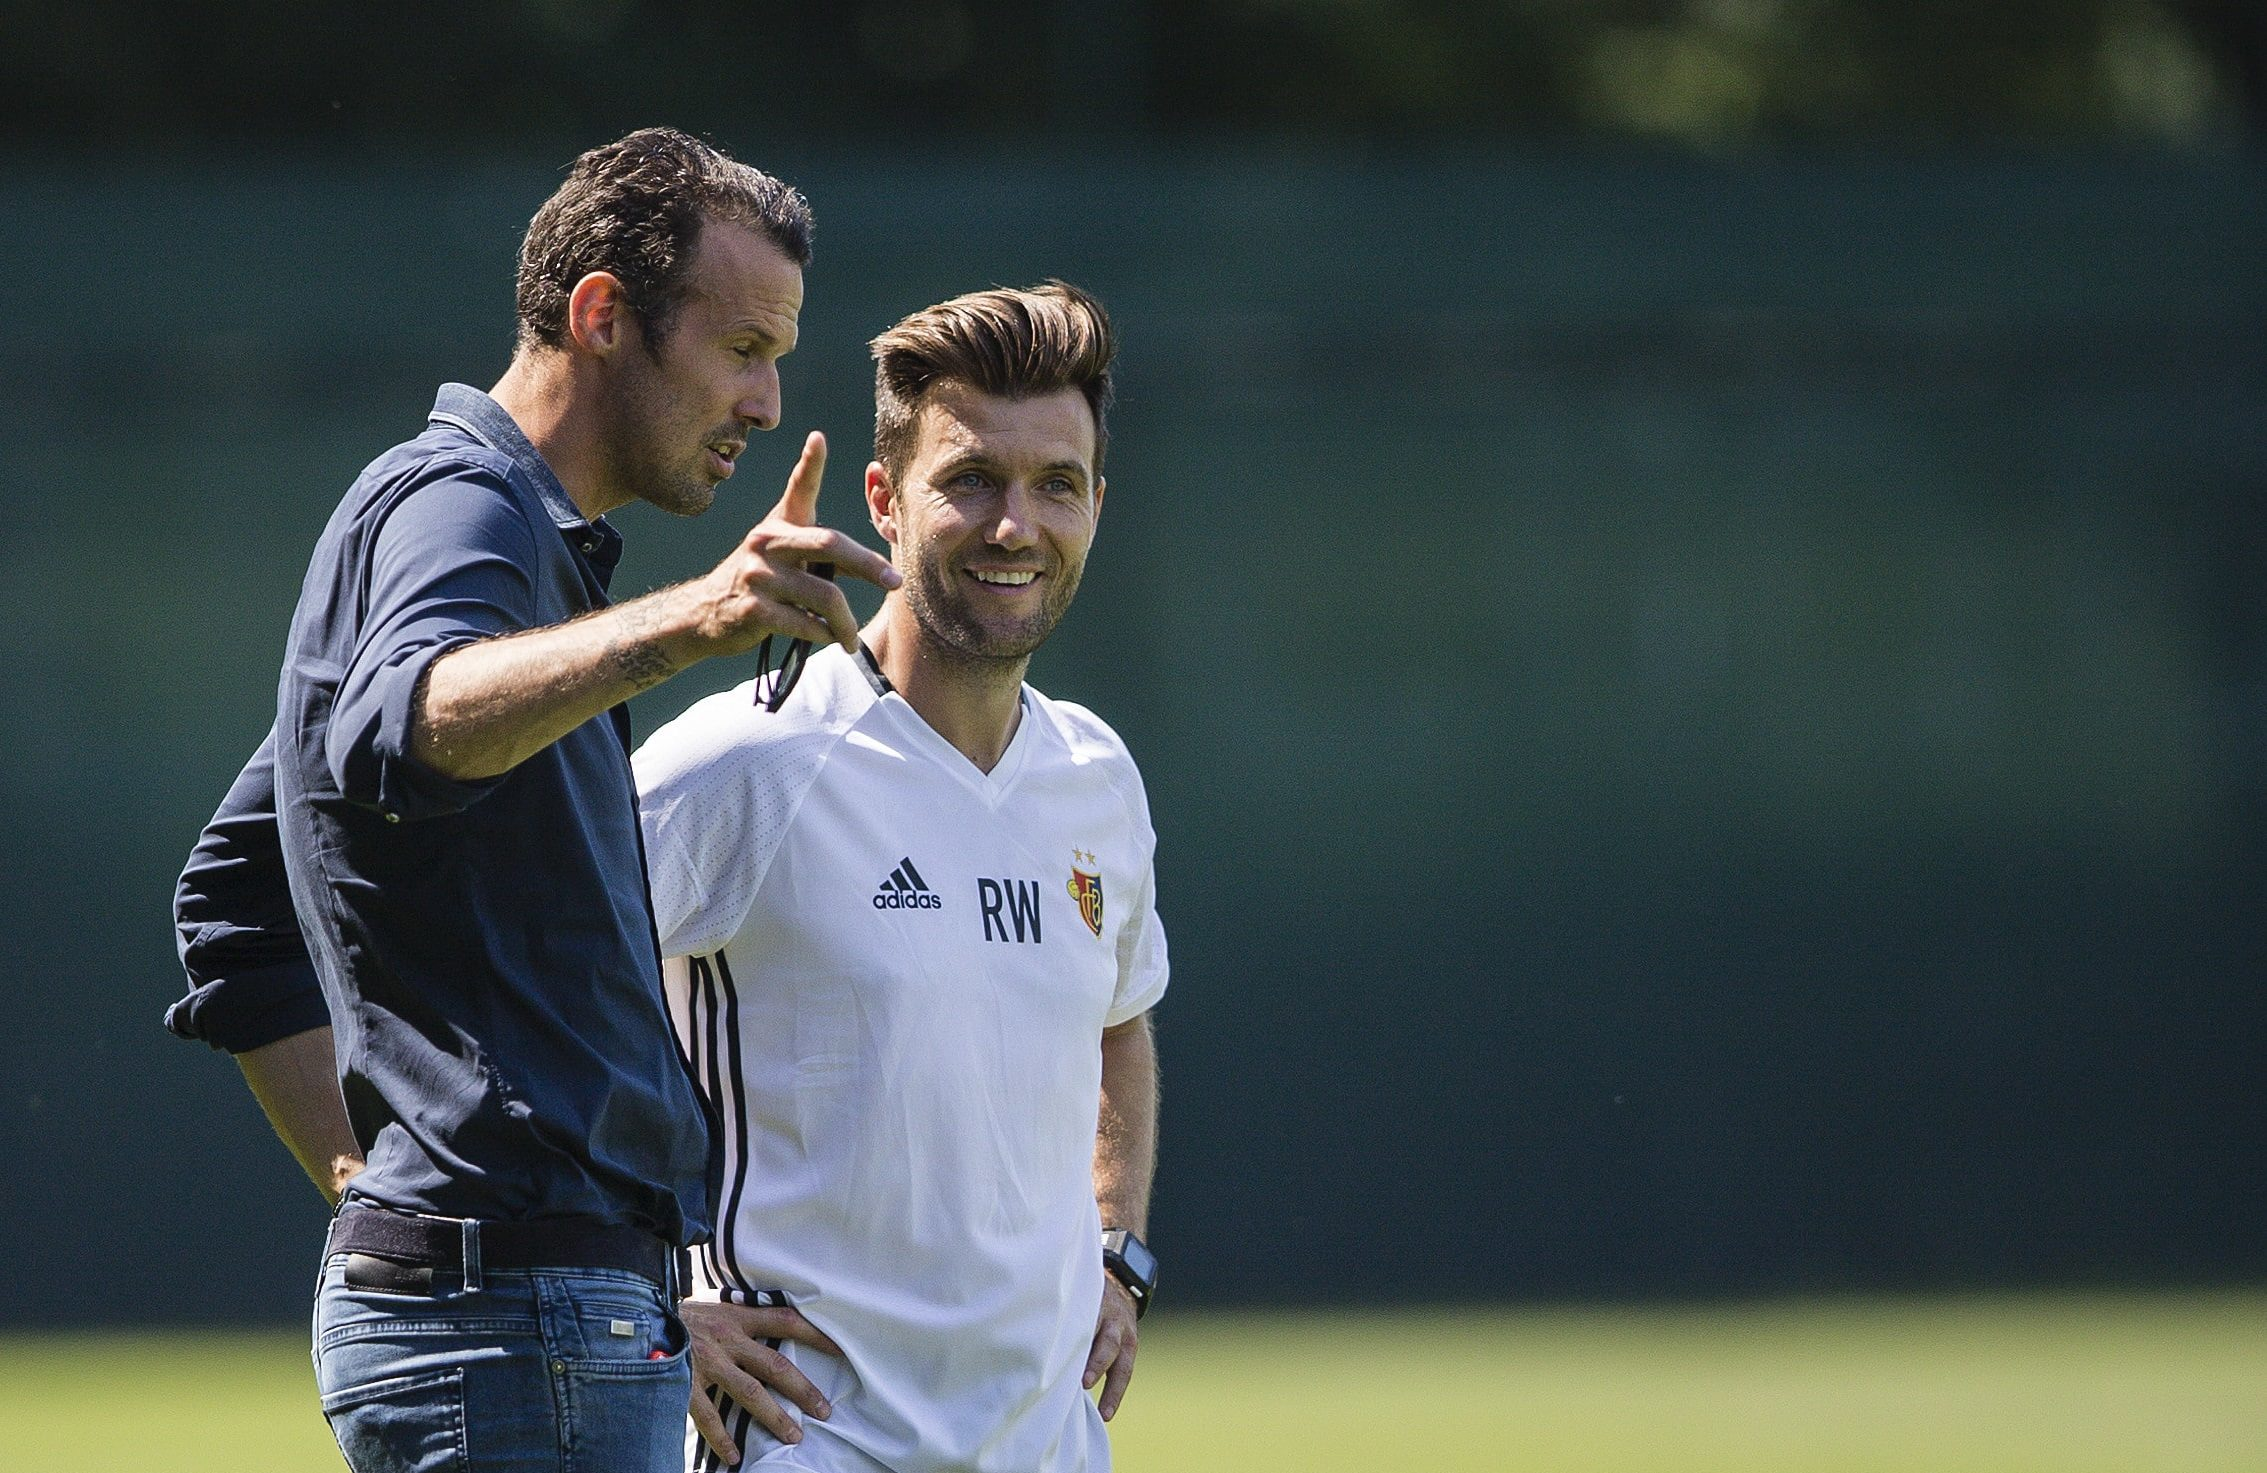 Basel, 22.6.2017 - Fussball Super League - Trainingsauftakt FC Basel, Sportchef Marco Streller und Trainer Raphael Wicky (Ste